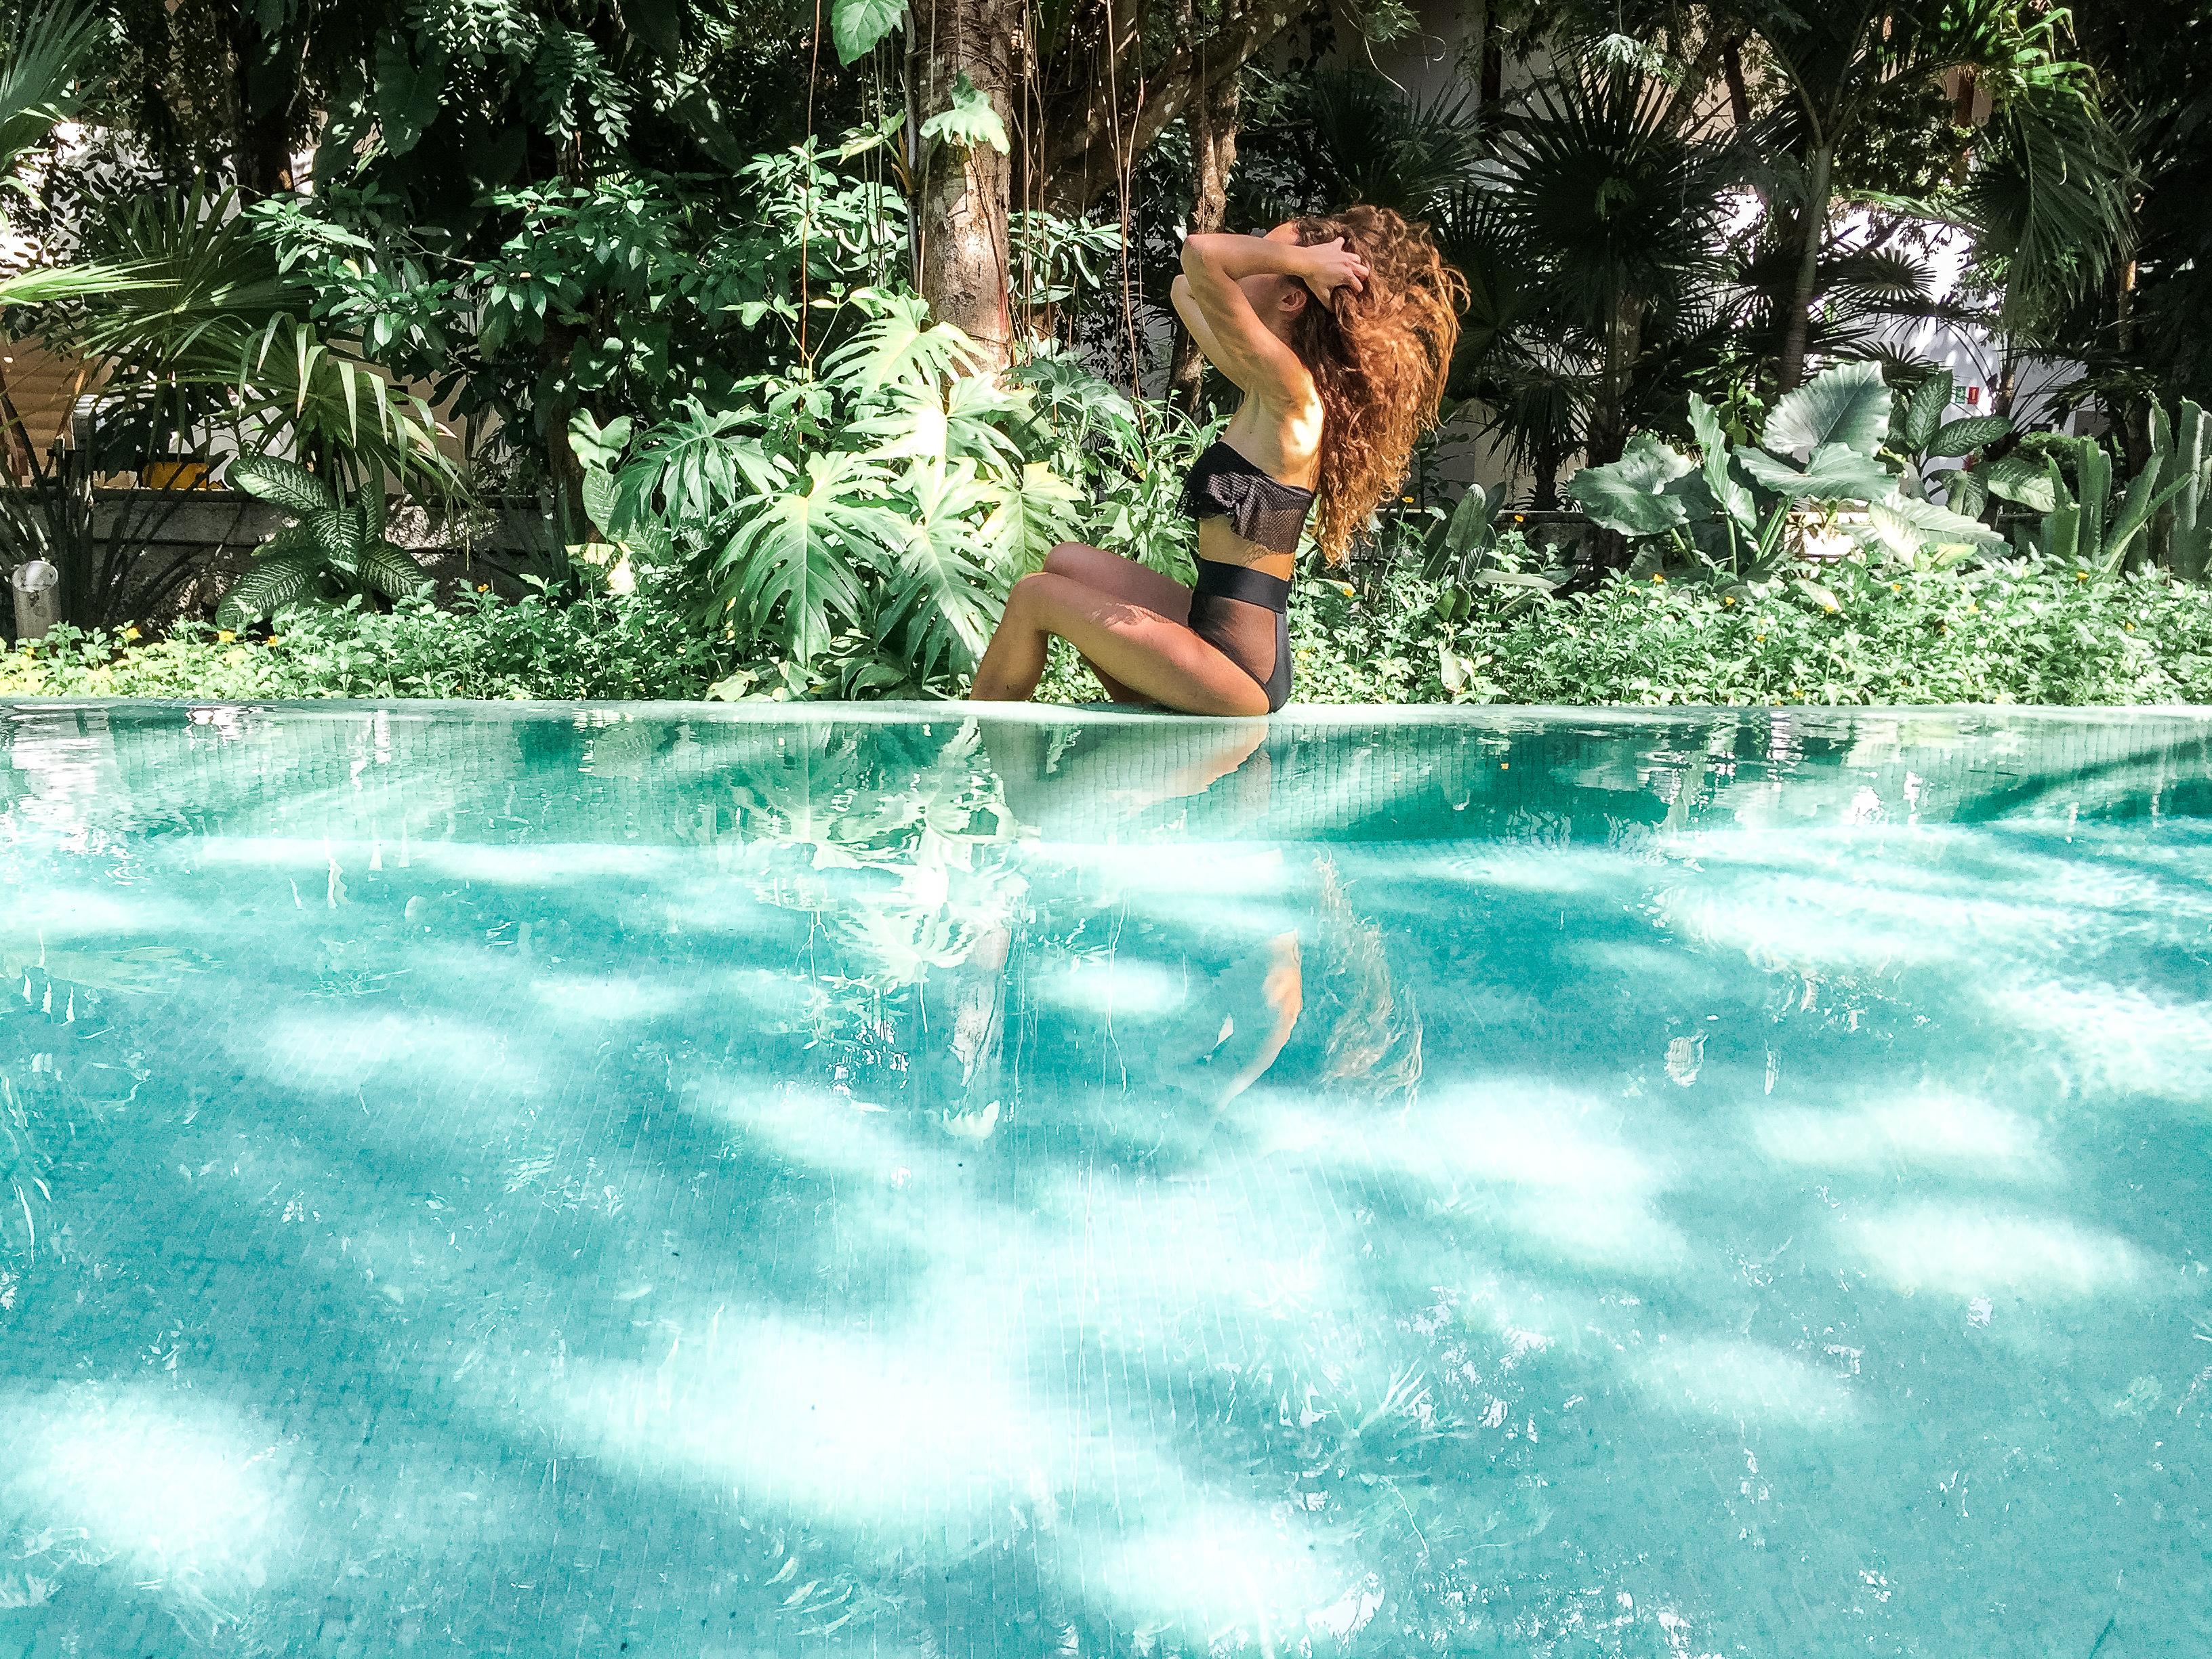 Hotel: The Explorean, Cozumel